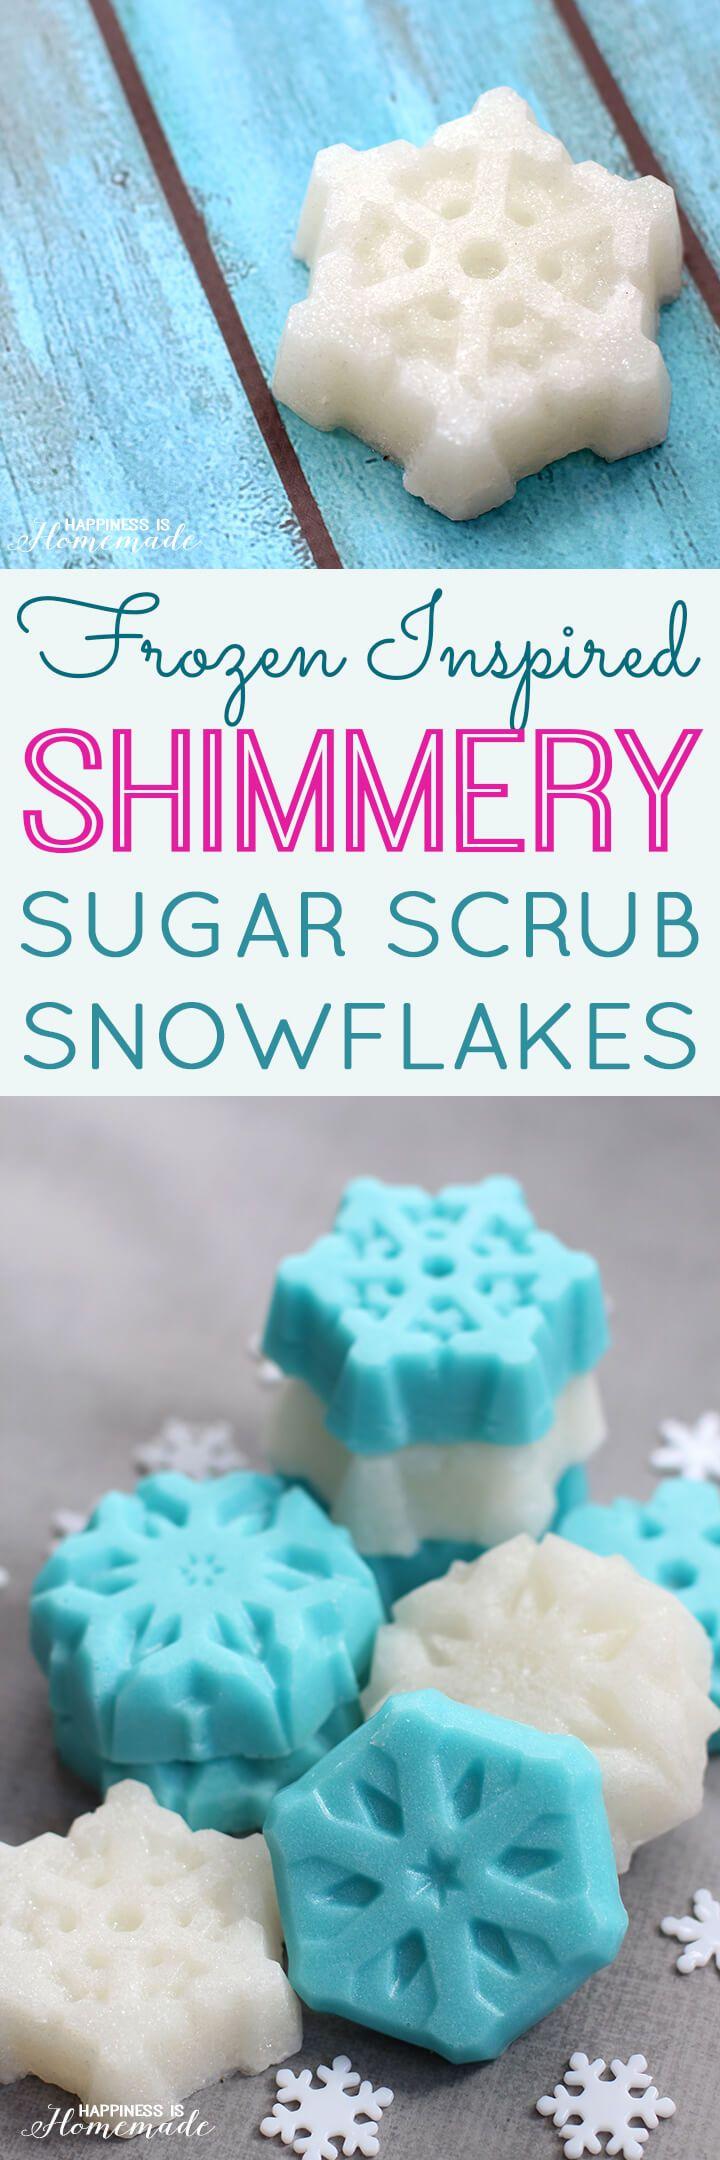 How to Make Frozen Inspired Shimmery Sugar Scrub Snowflake Bars